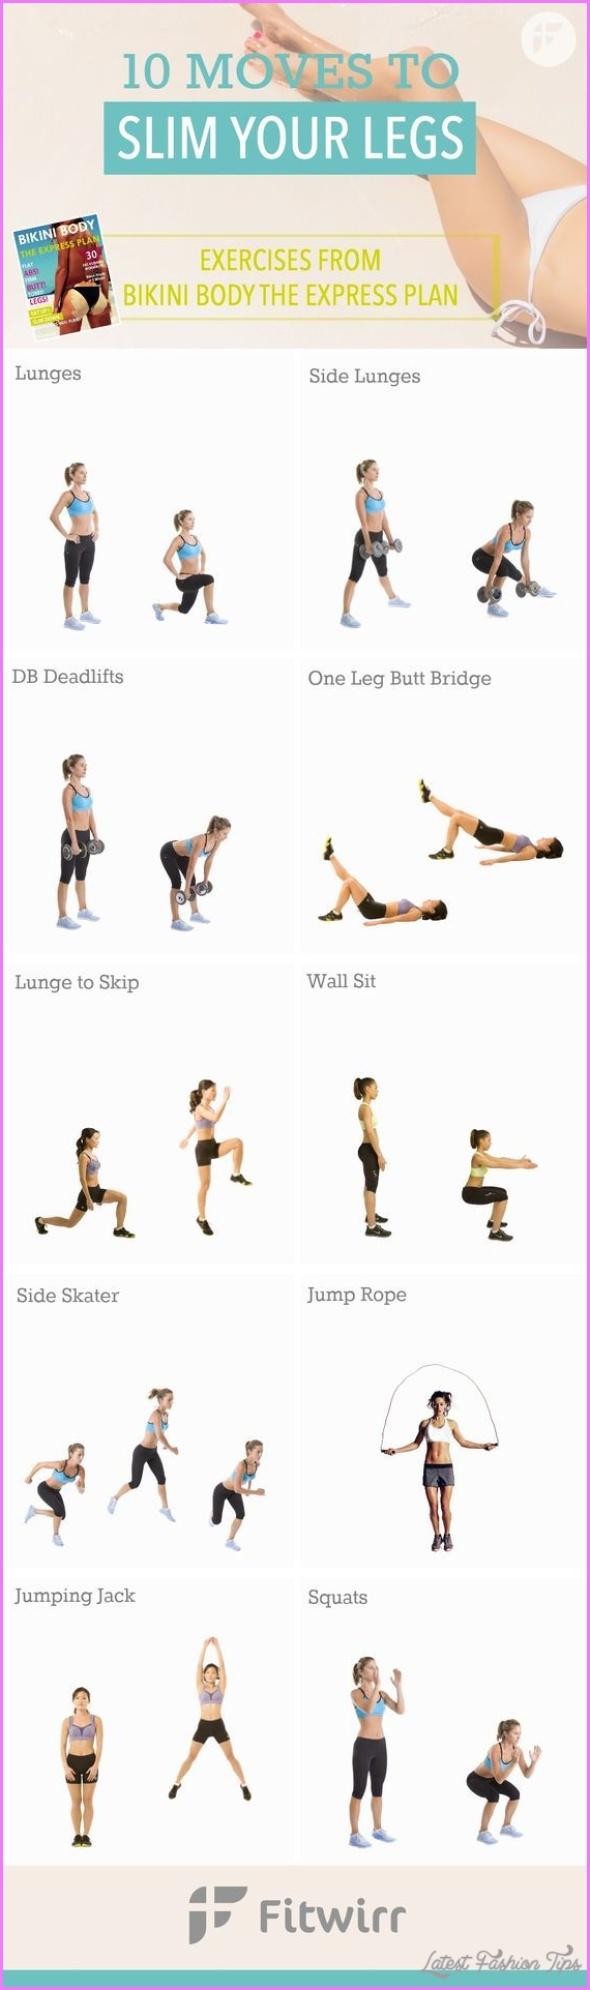 10 Best Exercises For Weight Loss _12.jpg